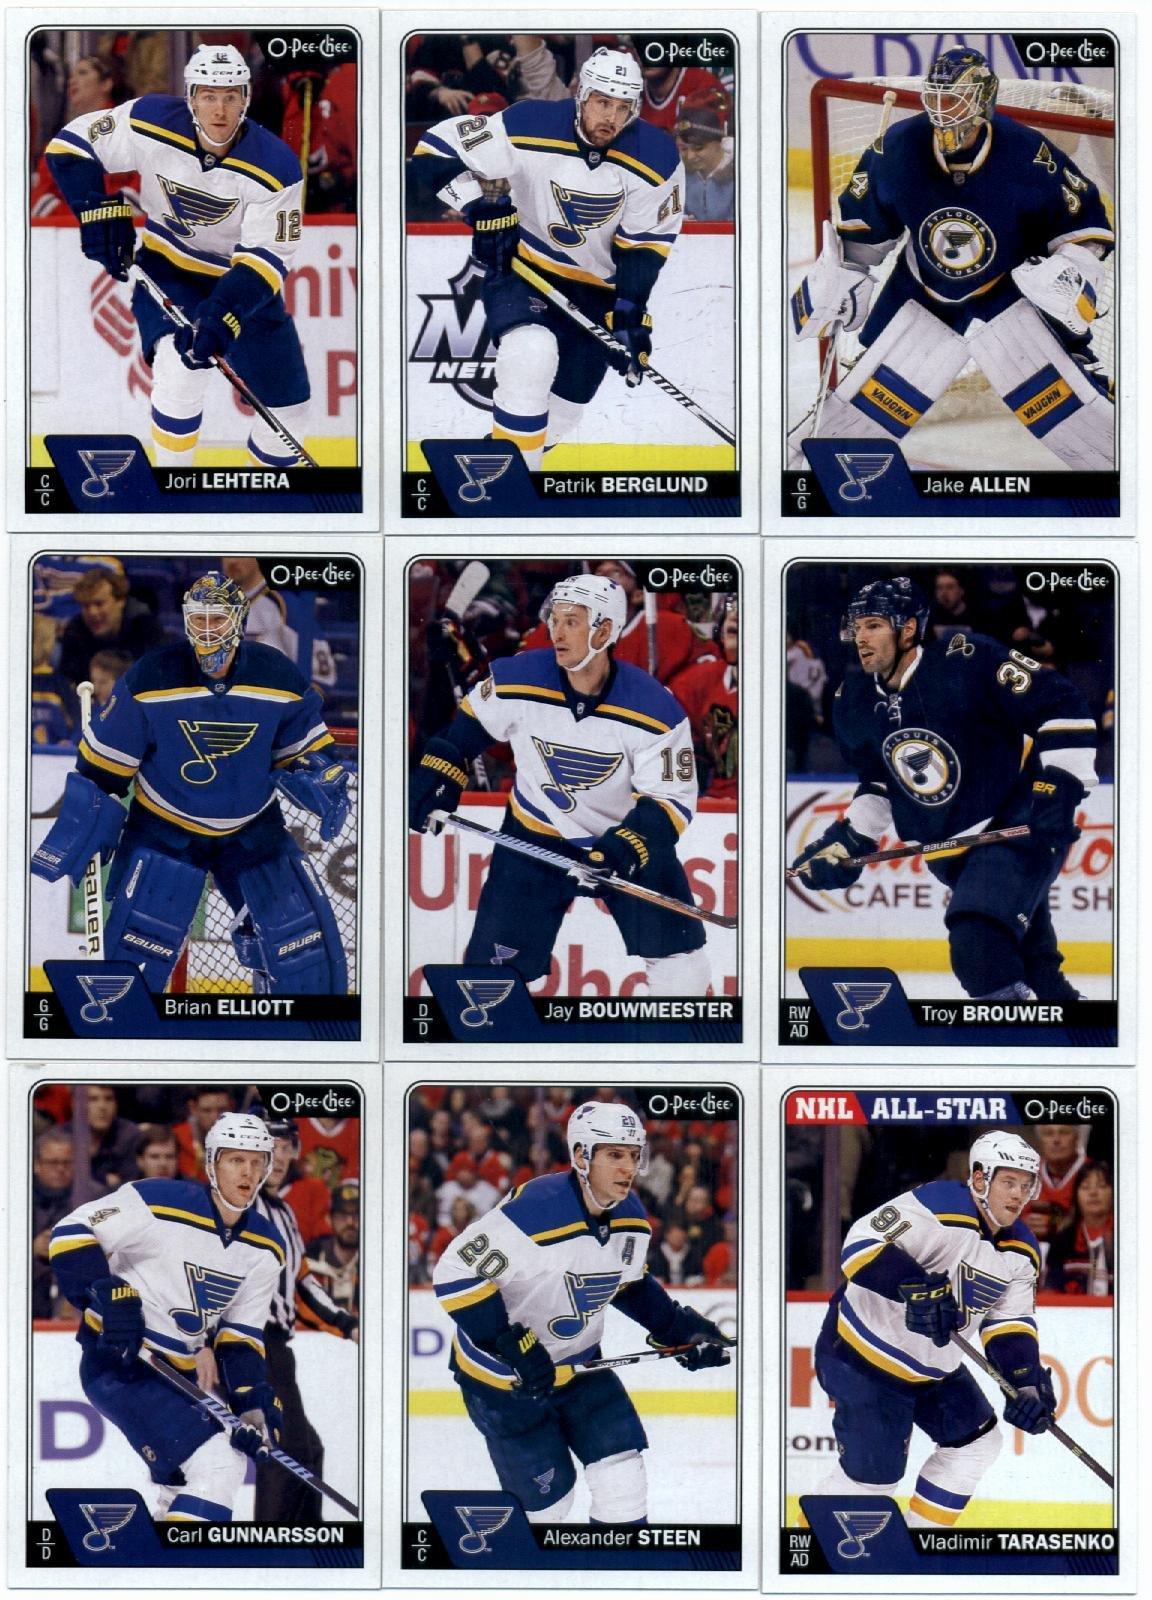 2016-17 O-Pee-Chee Hockey St. Louis Blues Team Set of 20 Cards SEALED in Protective Snap Case: Jake Allen(#47), Patrik Berglund(#86), Jori Lehtera(#130), Troy Brouwer(#139), Jay Bouwmeester(#159), Brian Elliott(#177), Vladimir Tarasenko(#236), Alexander Steen(#258), Carl Gunnarsson(#294), Scottie